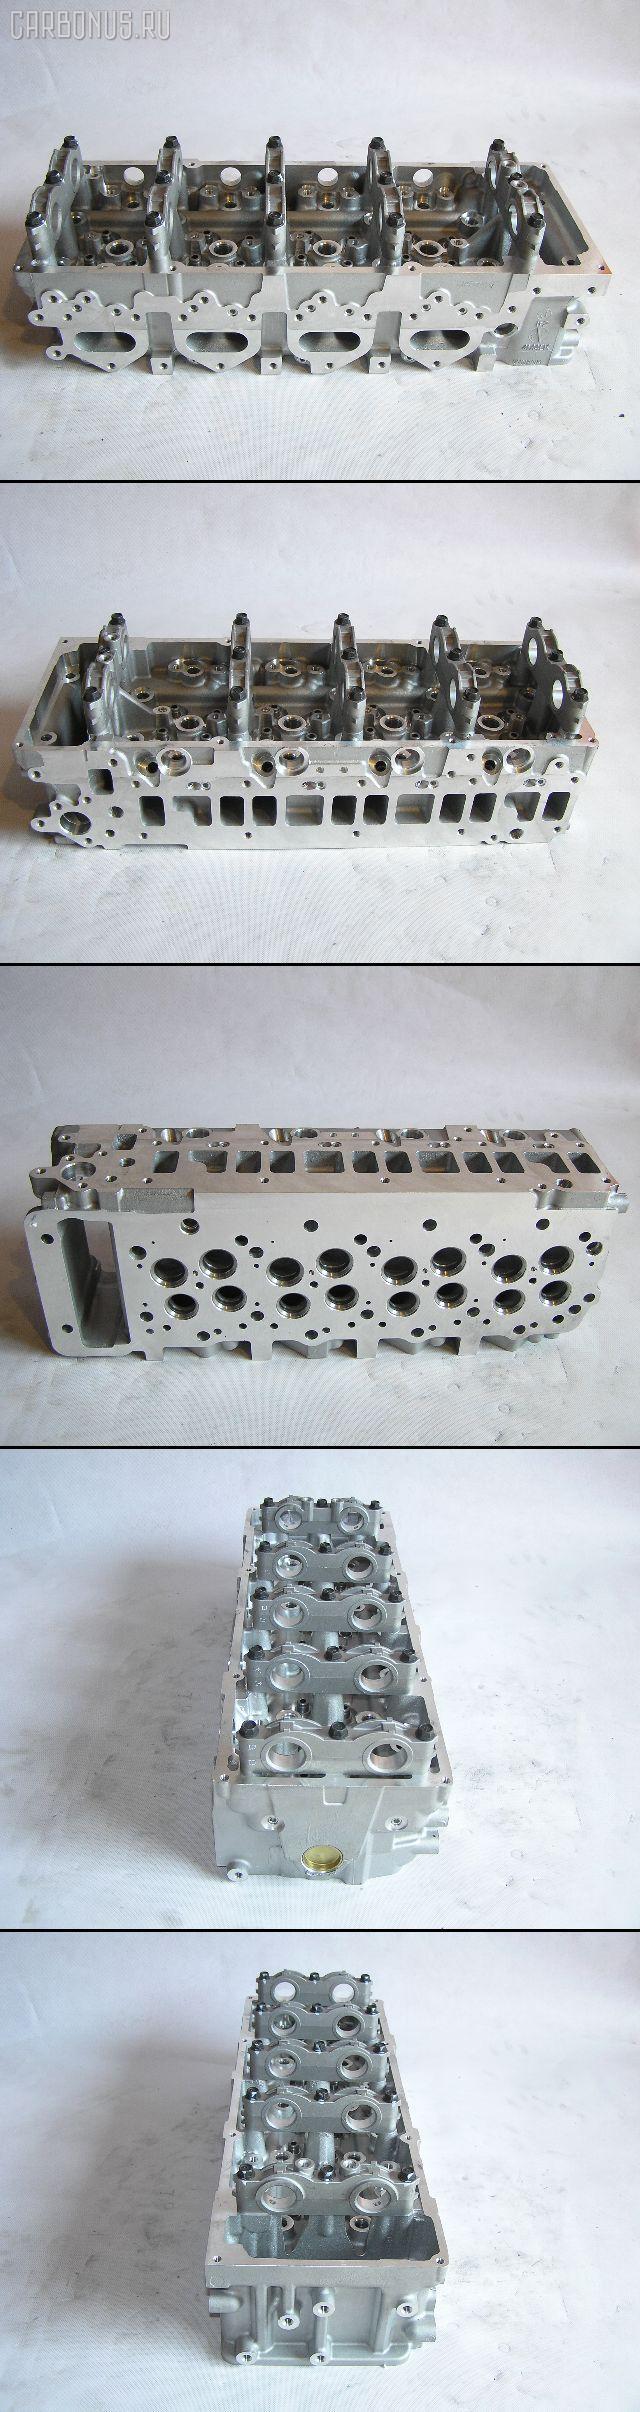 Головка блока цилиндров MITSUBISHI 4M41